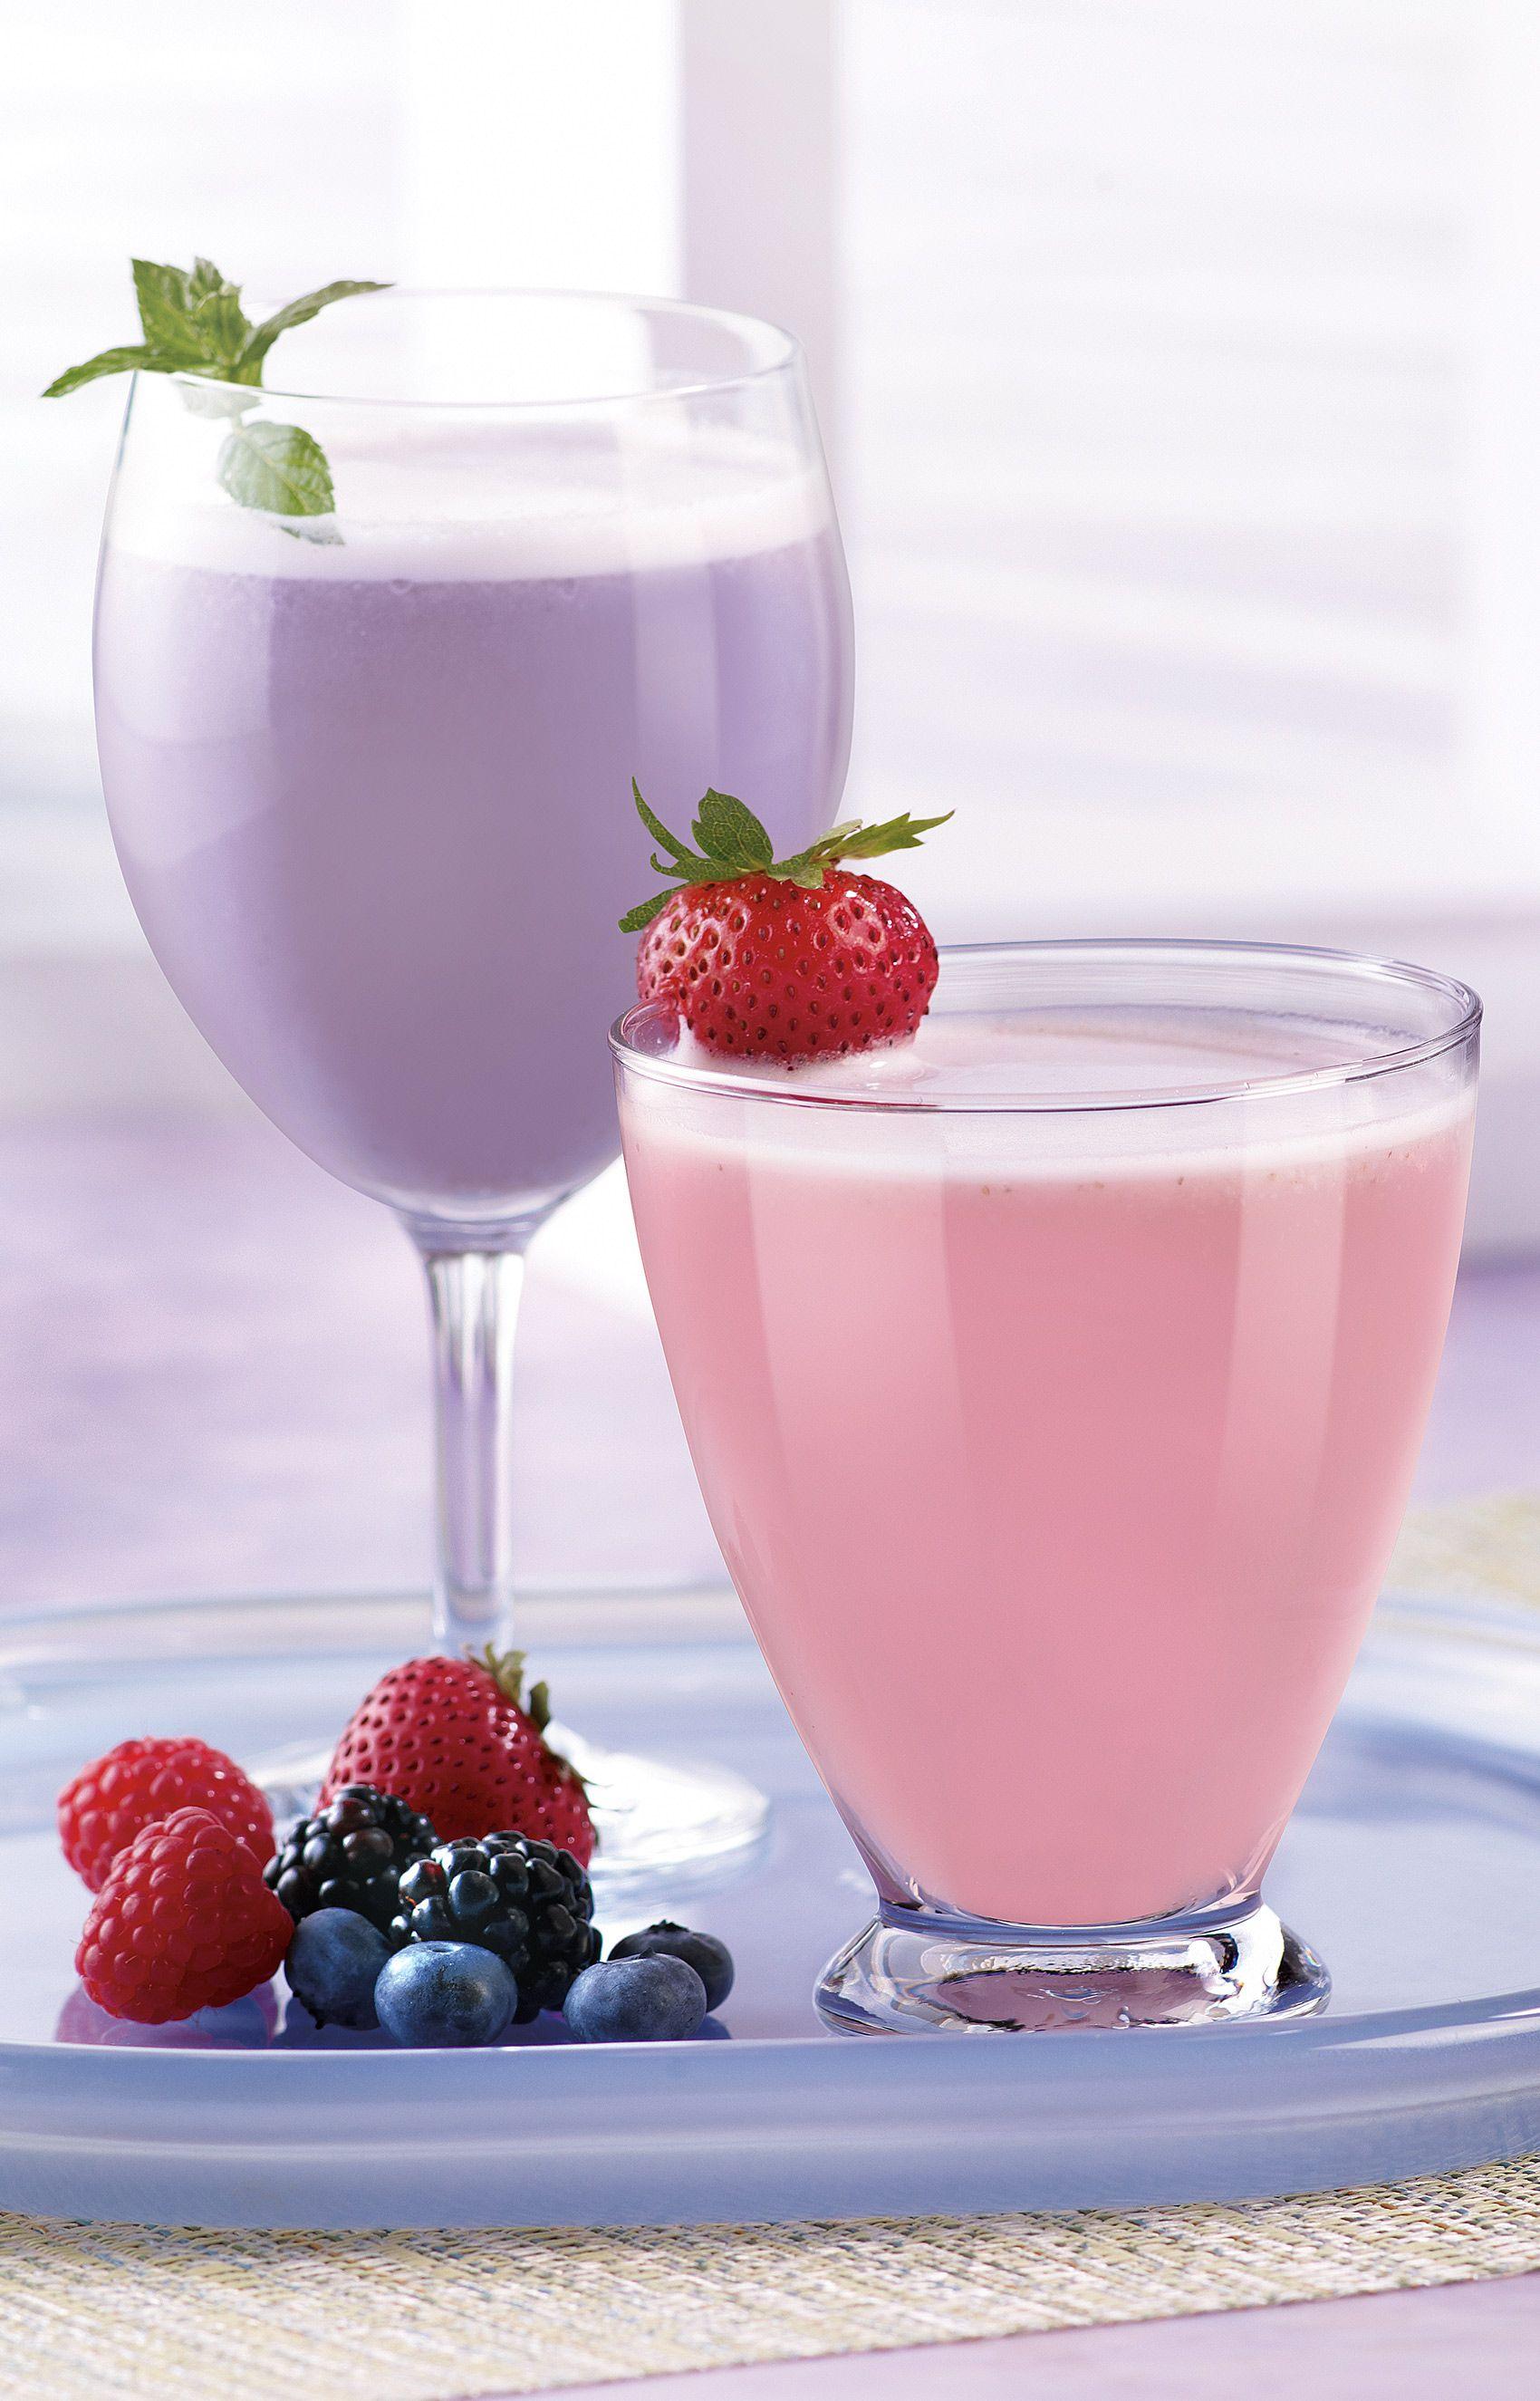 Berry_Strawberry-Marketing-2.jpg